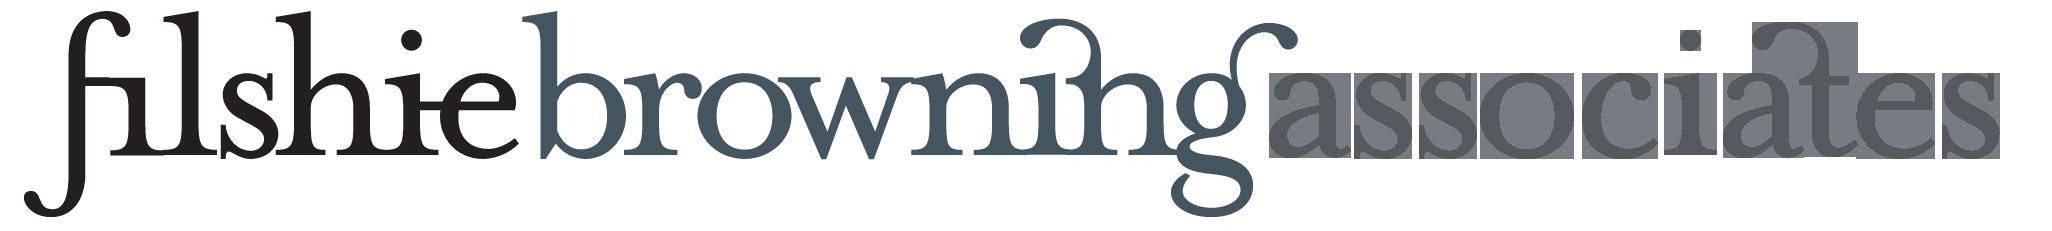 logo-transparent smaller - withoutslogan2.png